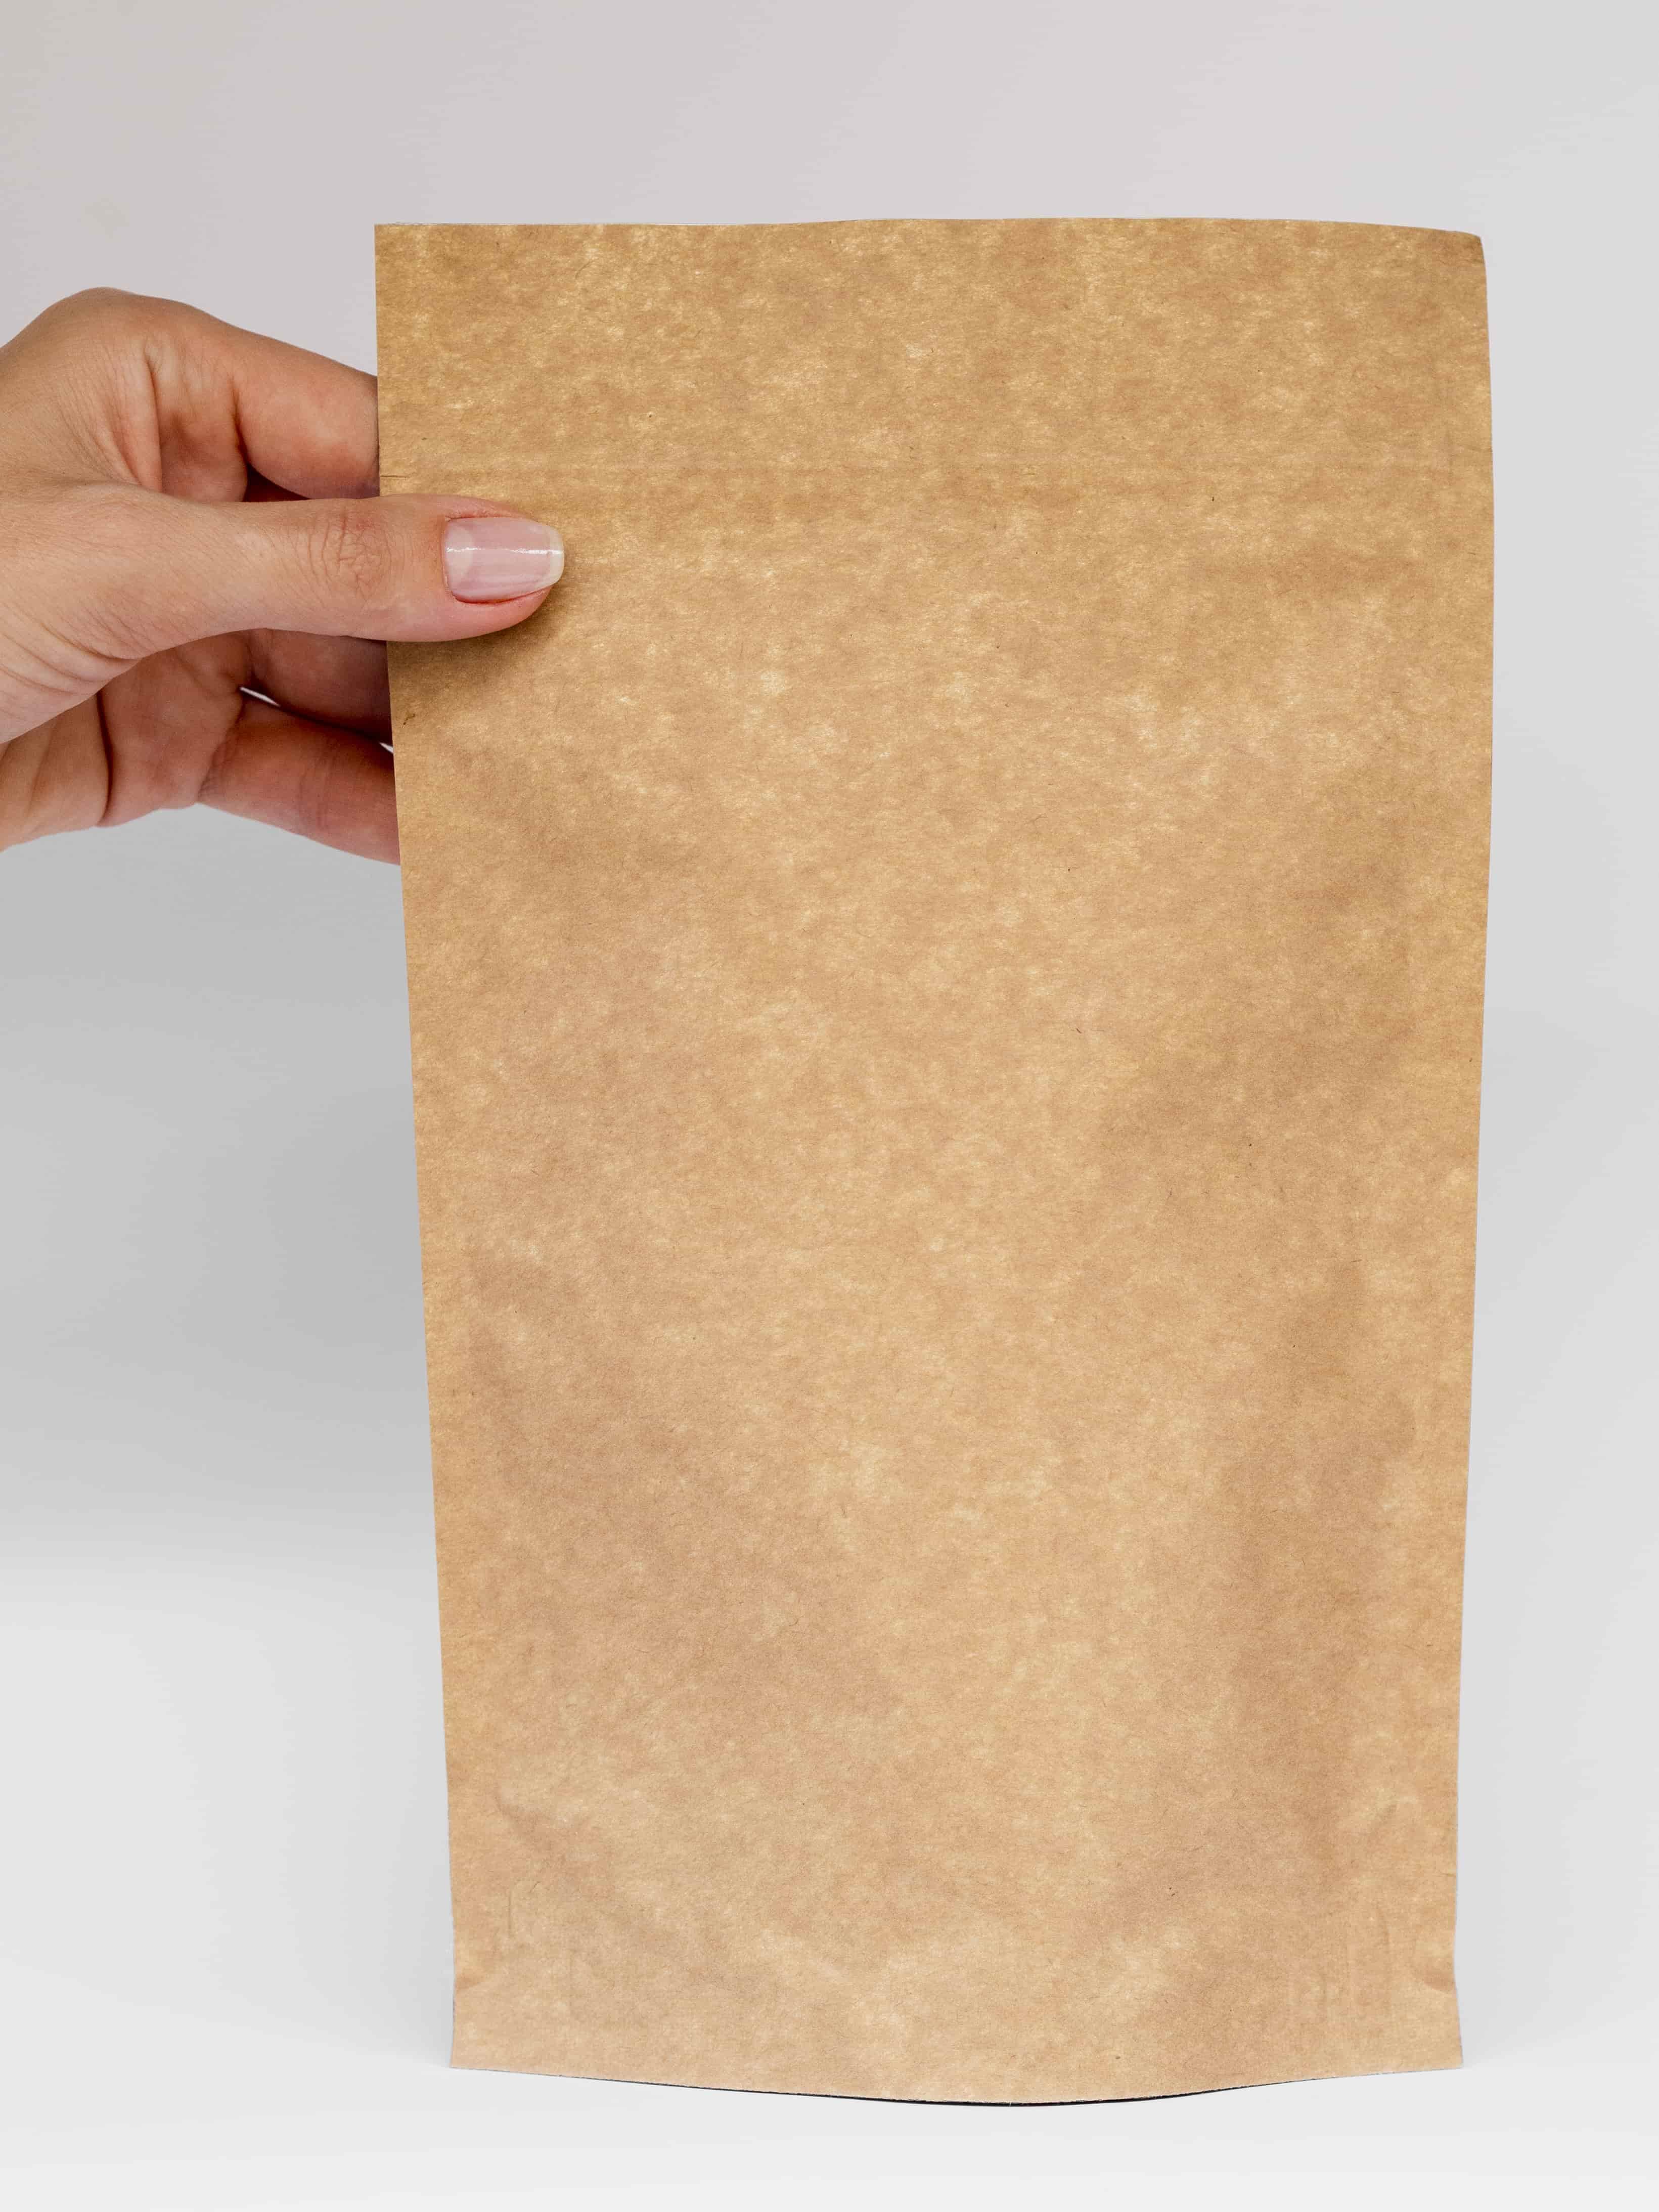 materiales packaging sostenibles ejemplos